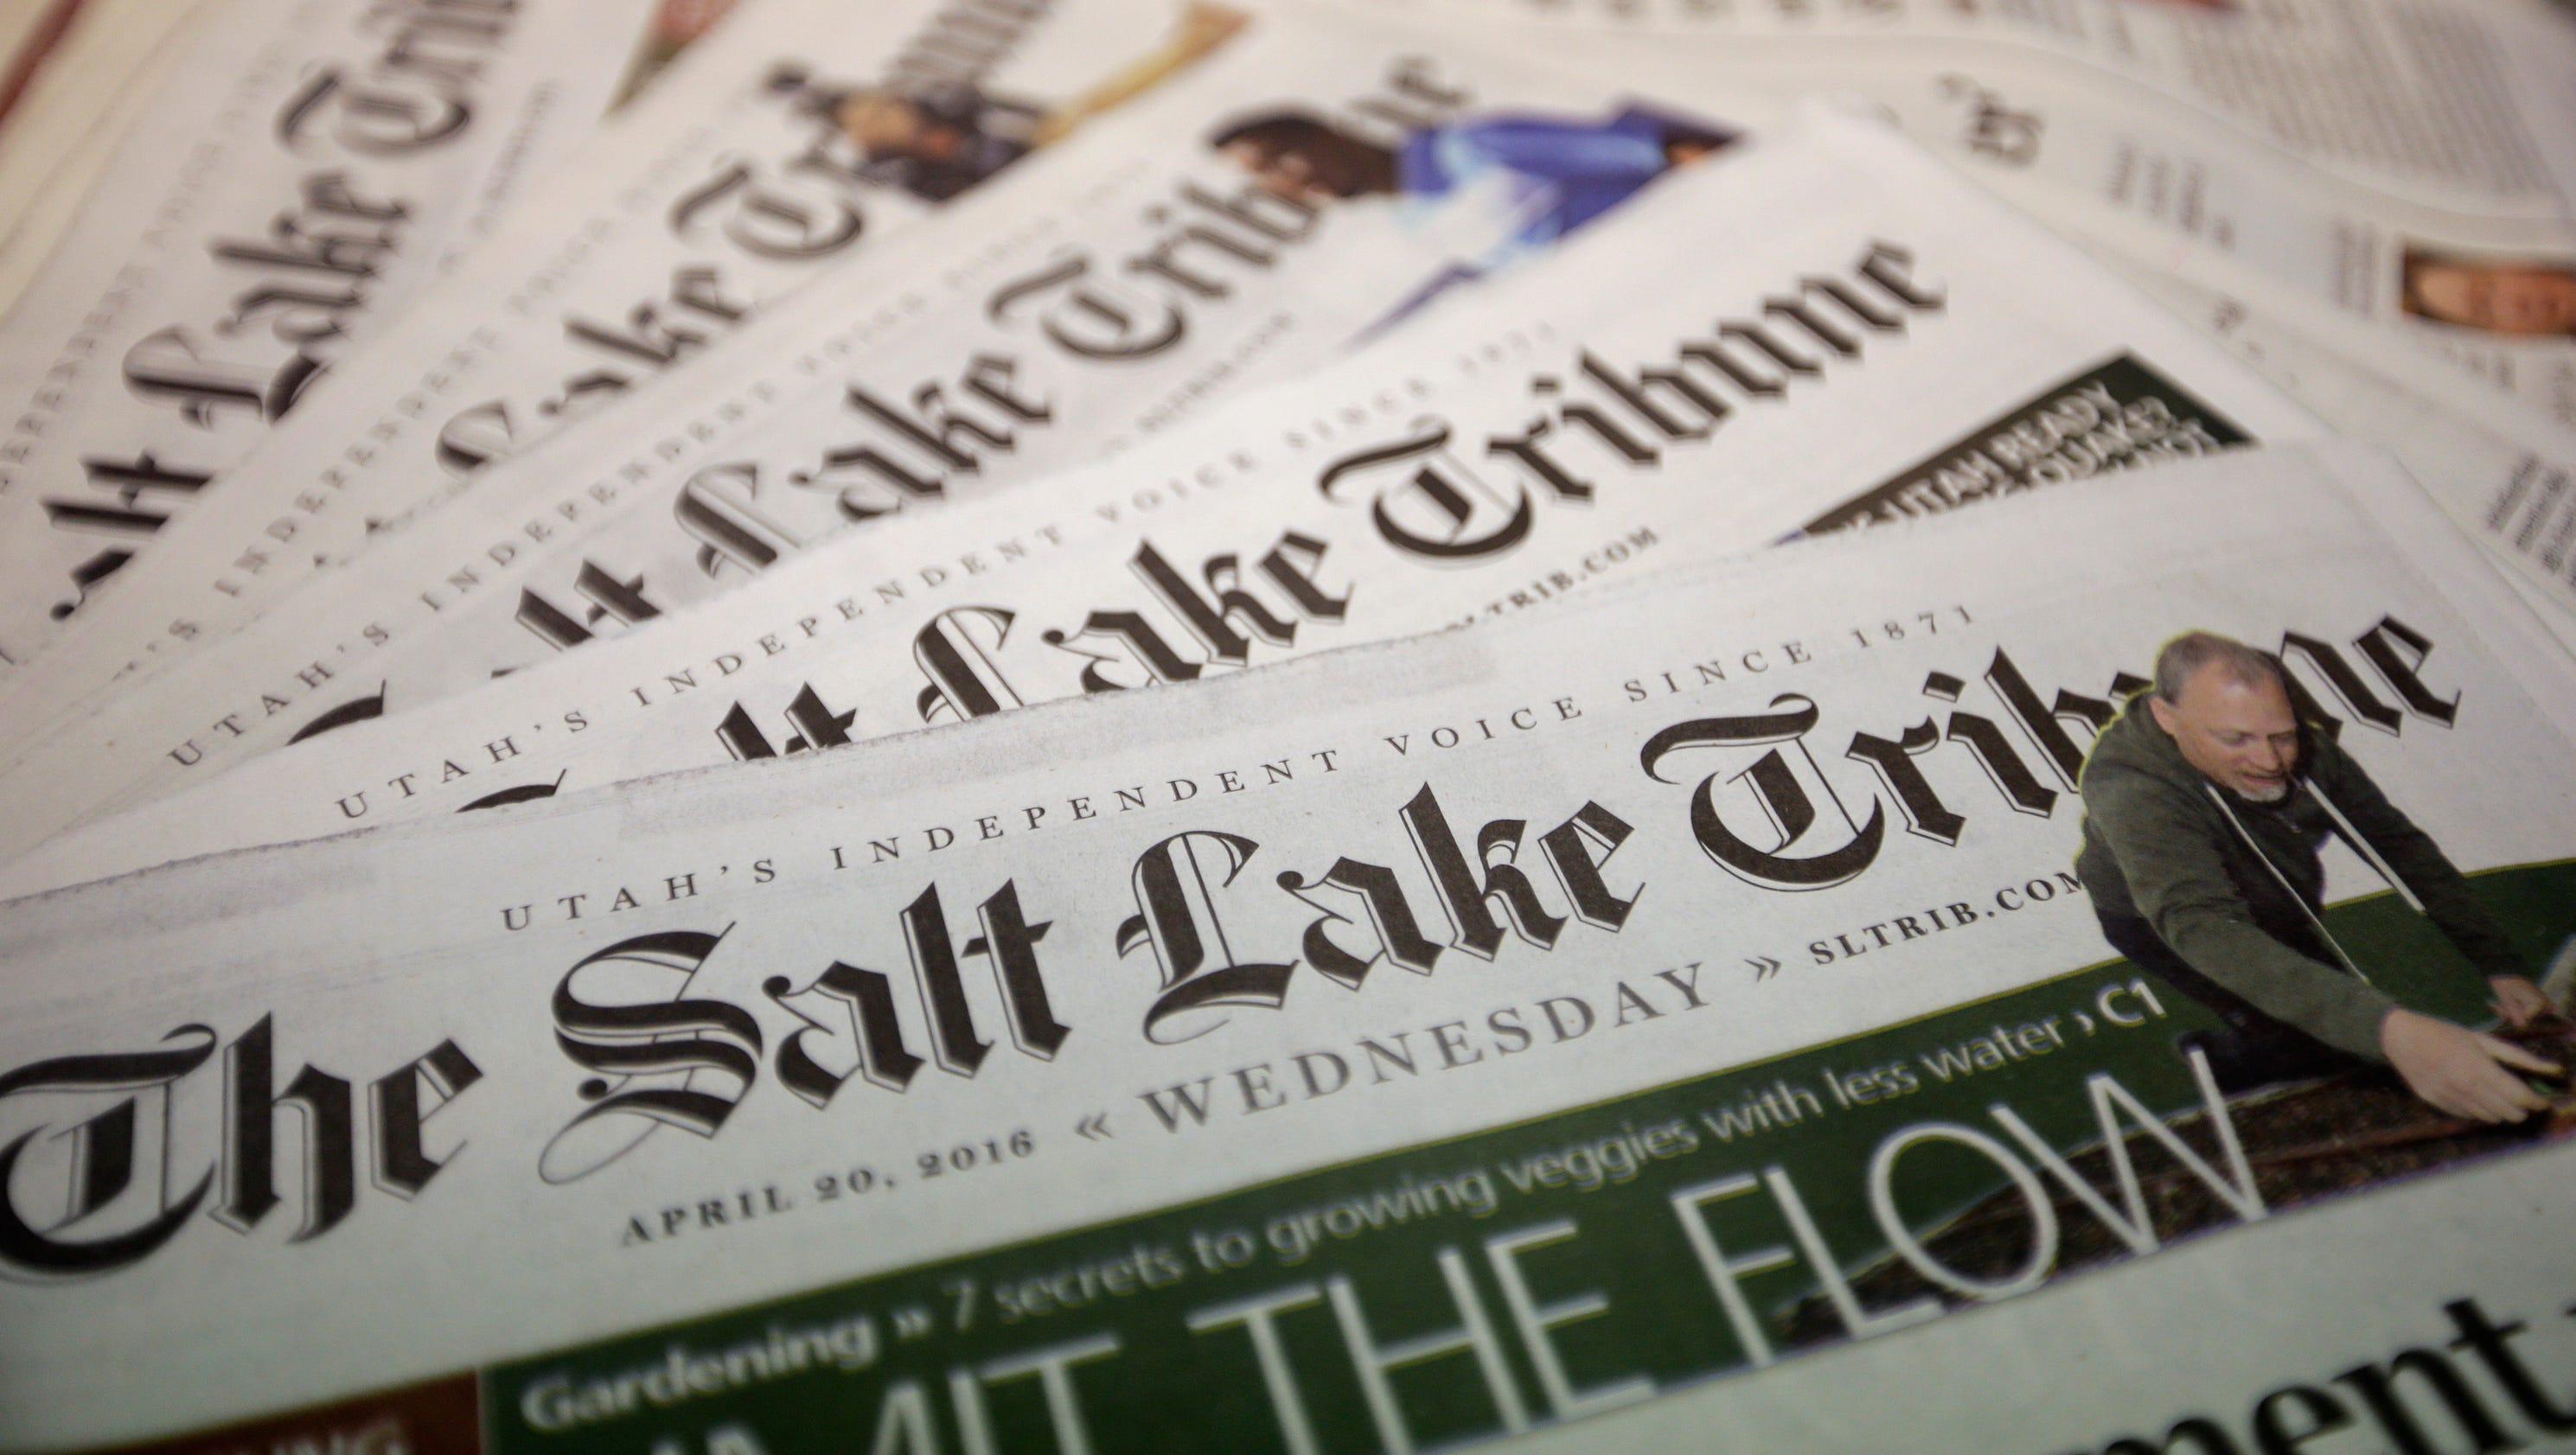 Huntsman Sr.: Salt Lake Tribune will maintain independence